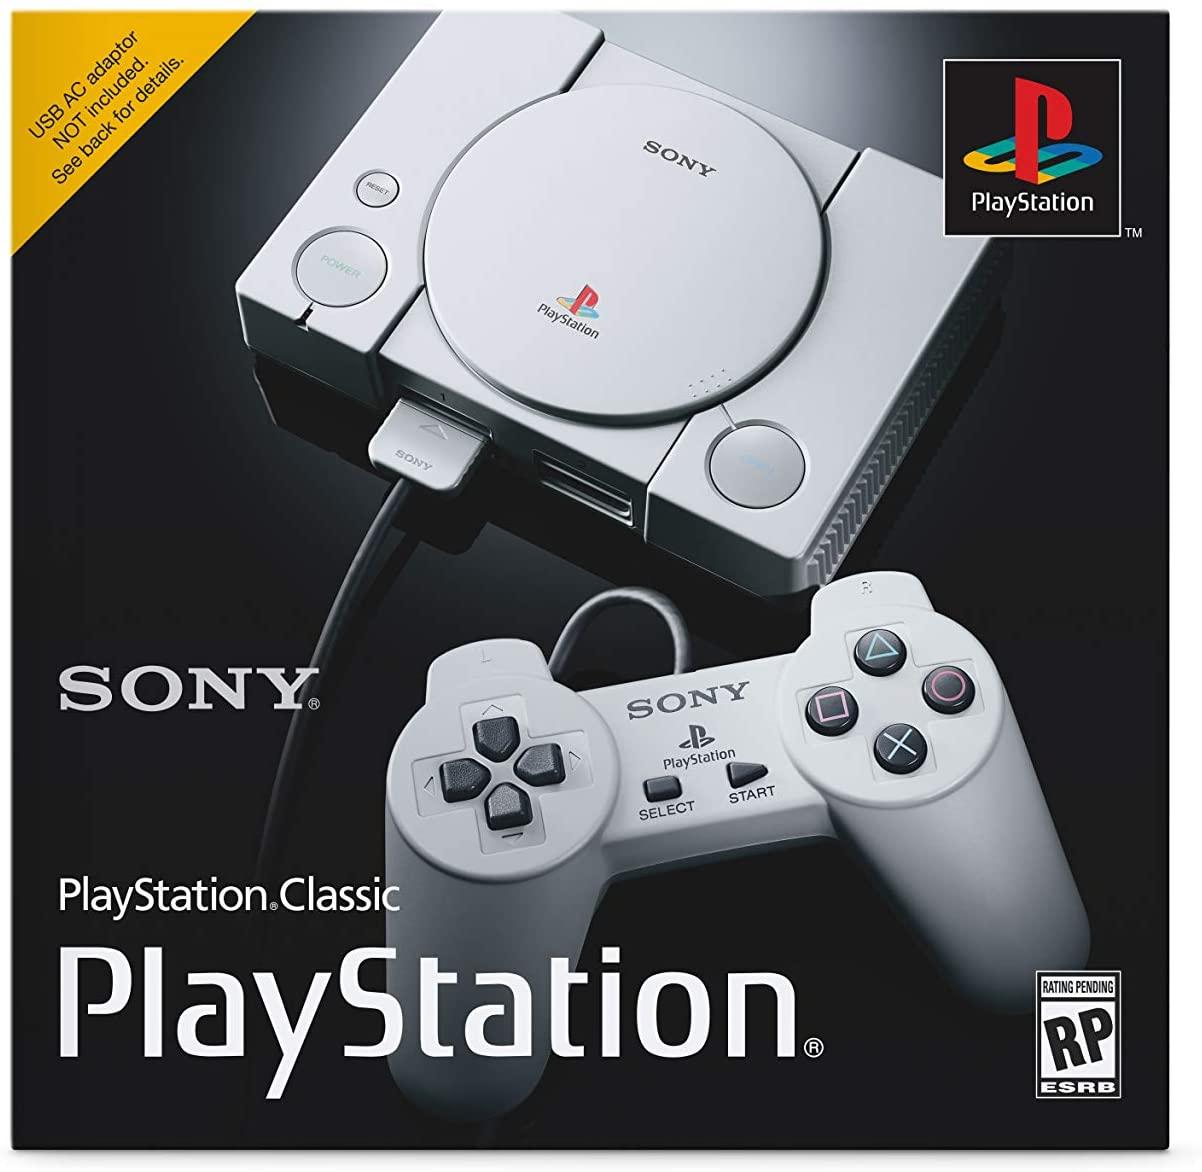 PLAYSTATION 1 CLASSIC دارای 20 بازی و 2 عدد کنترلر (دسته)